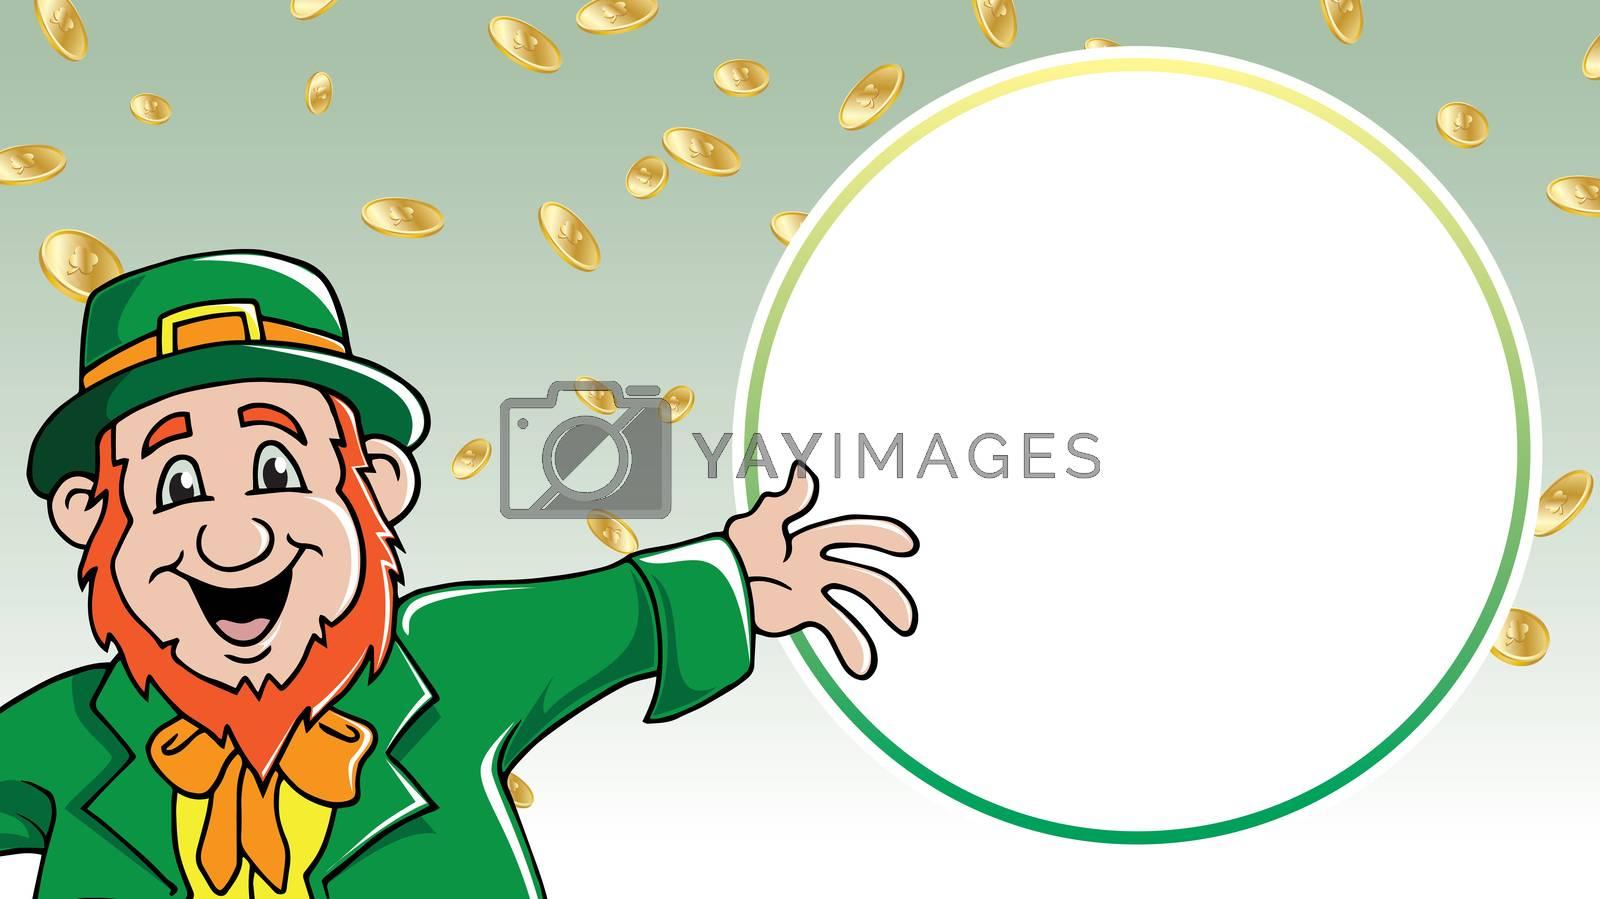 Saint Patrick's Day leprechaun shouting message among gold coins retail sale